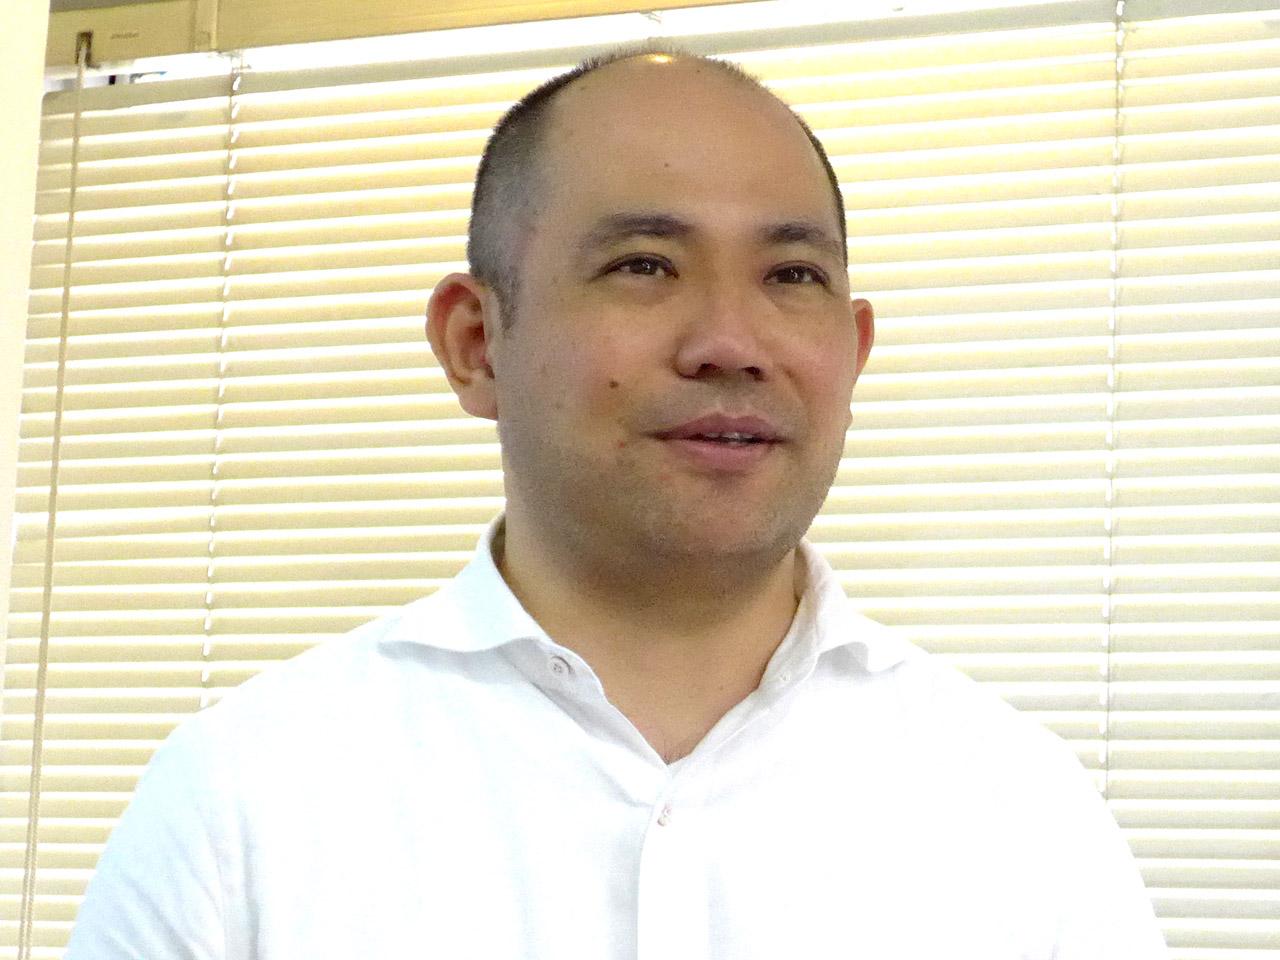 Dayz株式会社代表取締役の玉城朝氏